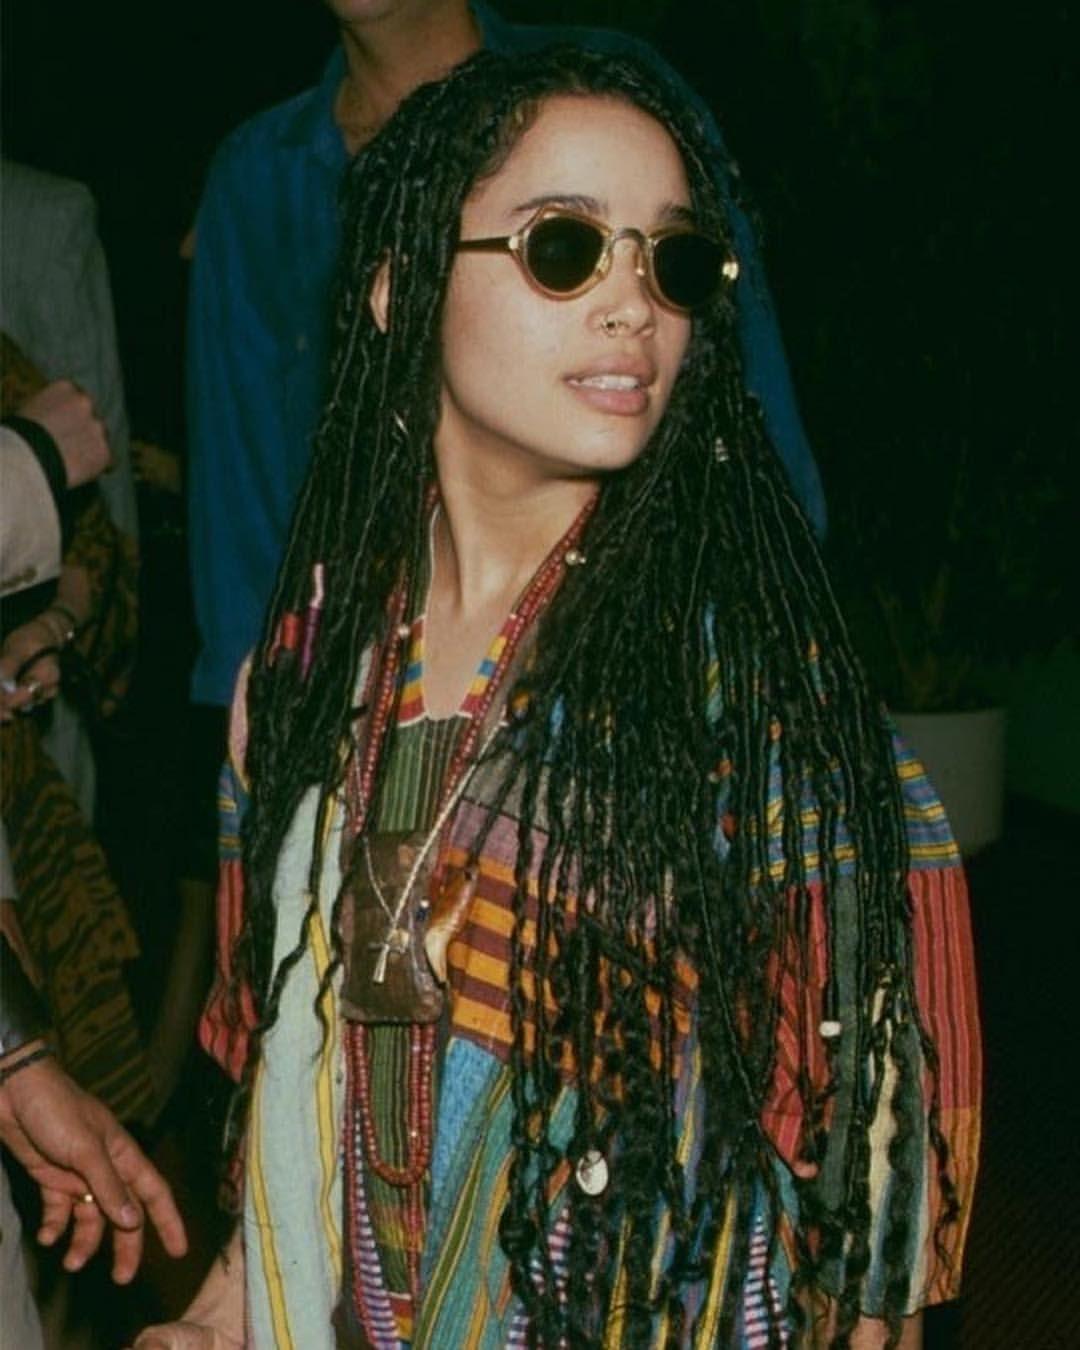 Lisa Bonet | Zoë Kravitz #lisabonet #zoekravitz #80s 90s #00s #zoekravitzstyle Lisa Bonet | Zoë Kravitz #lisabonet #zoekravitz #80s 90s #00s #zoekravitz Lisa Bonet | Zoë Kravitz #lisabonet #zoekravitz #80s 90s #00s #zoekravitzstyle Lisa Bonet | Zoë Kravitz #lisabonet #zoekravitz #80s 90s #00s #zoekravitz